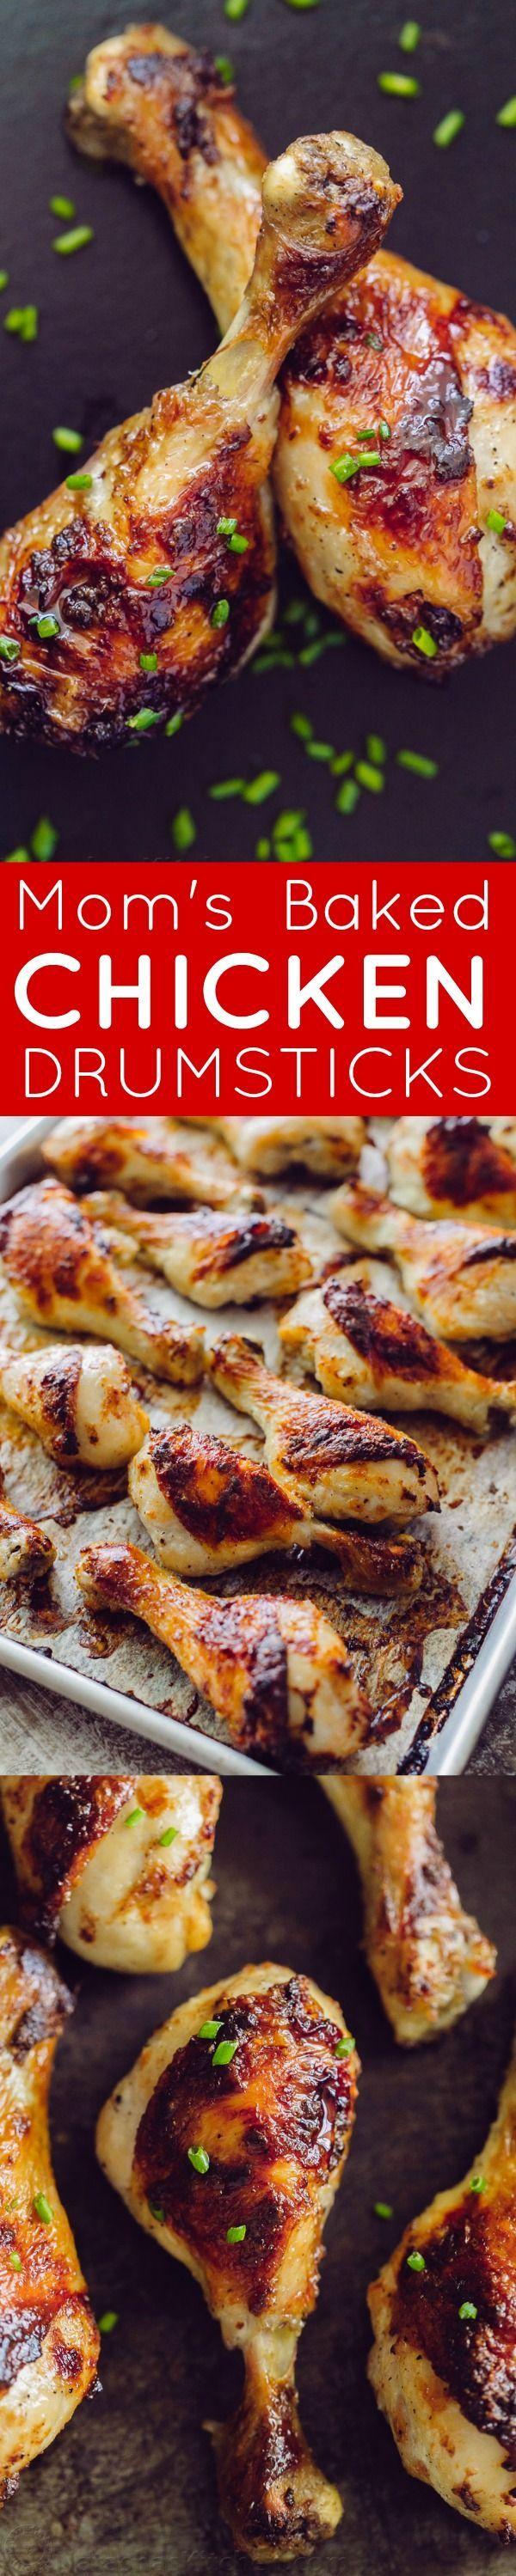 Tender, juicy baked chicken drumsticks with a crisp, salty skin. Marinade has only 4 ingredients. Mom's method makes these chicken drumsticks finger-lickin' good! | http://natashaskitchen.com